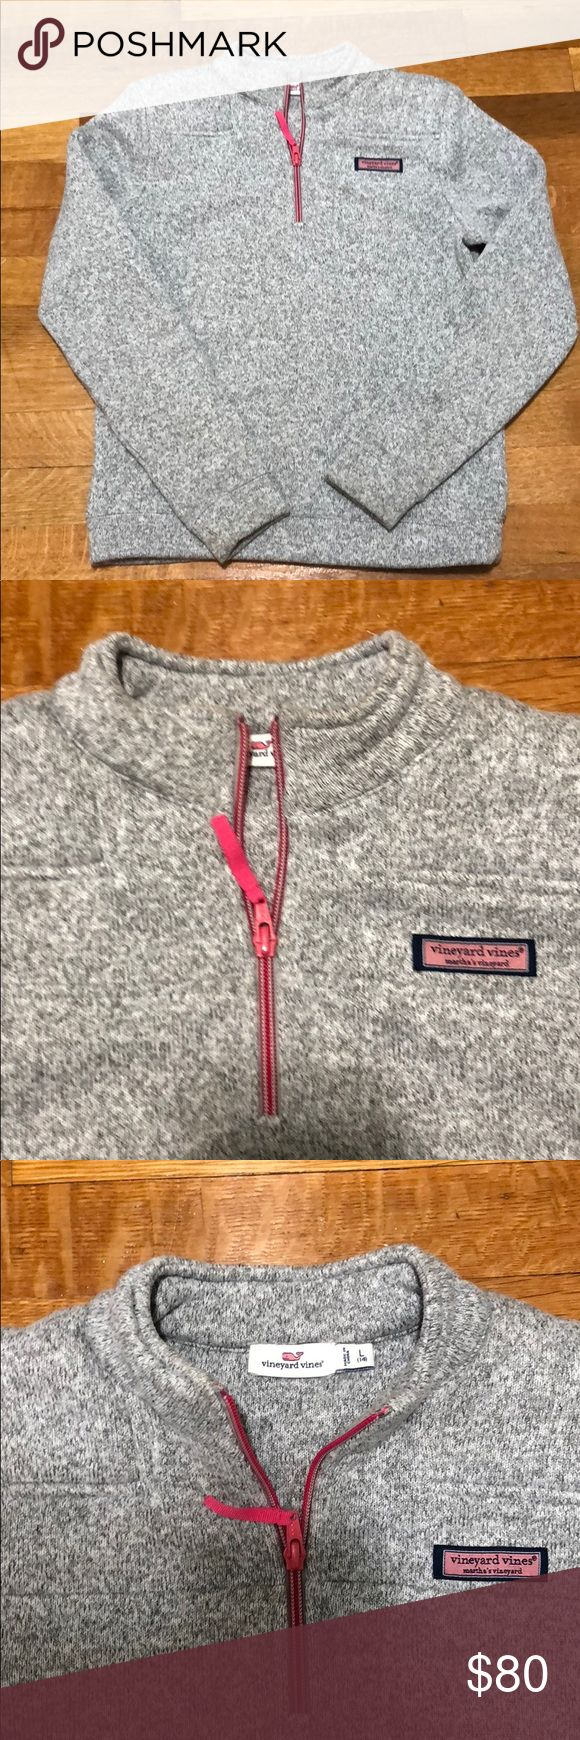 Vineyard vines girls sweater EUC barely worn - grey with pink 1/4 zipper. Vineyard Vines Shirts & Tops Sweatshirts & Hoodies